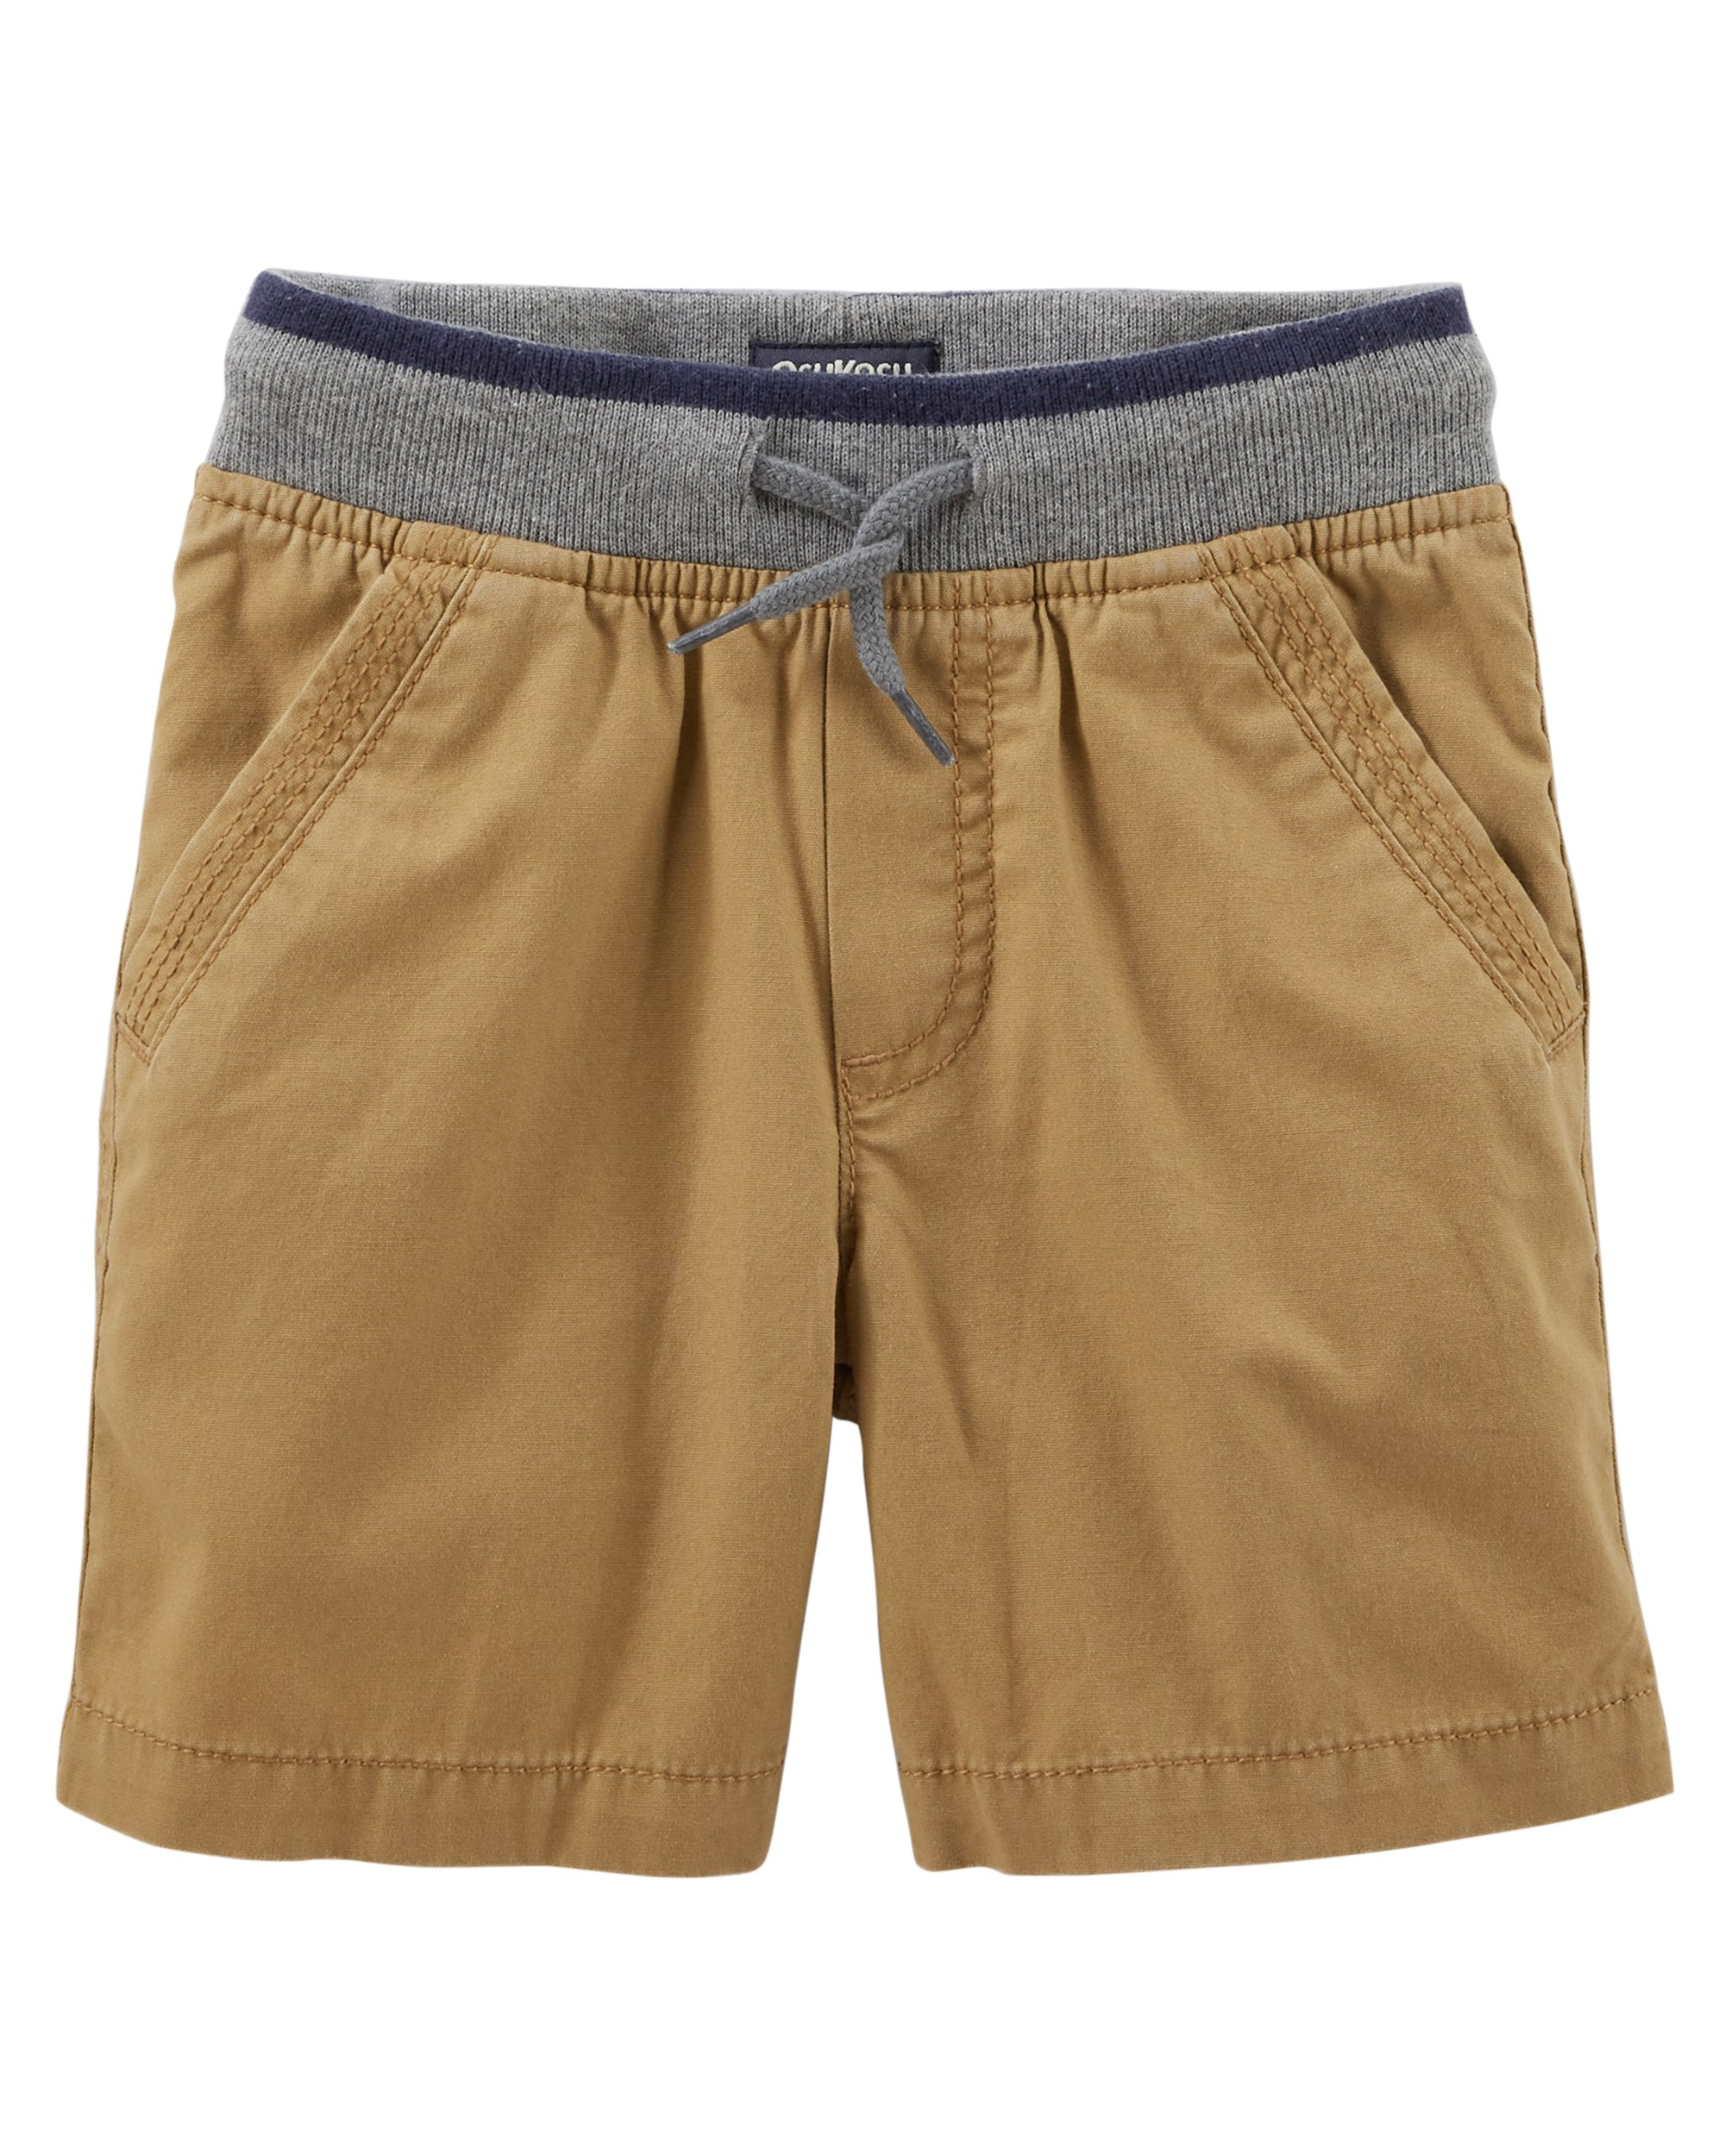 Osh Kosh Boys' Kids Pull on Short, Nutkin, 10